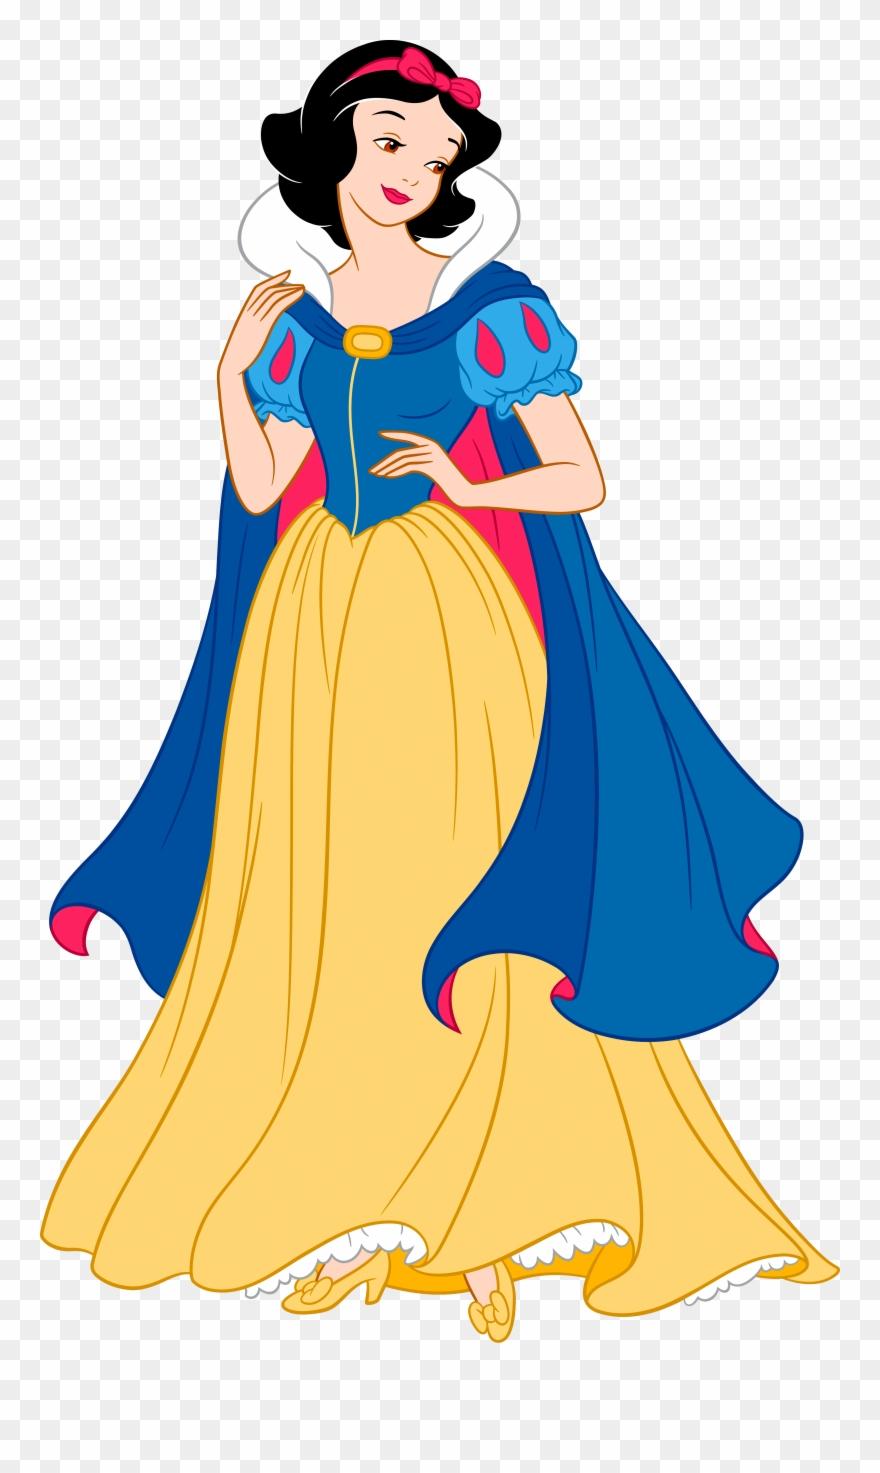 Cinderella clipart christmas. Cliparts disney princess